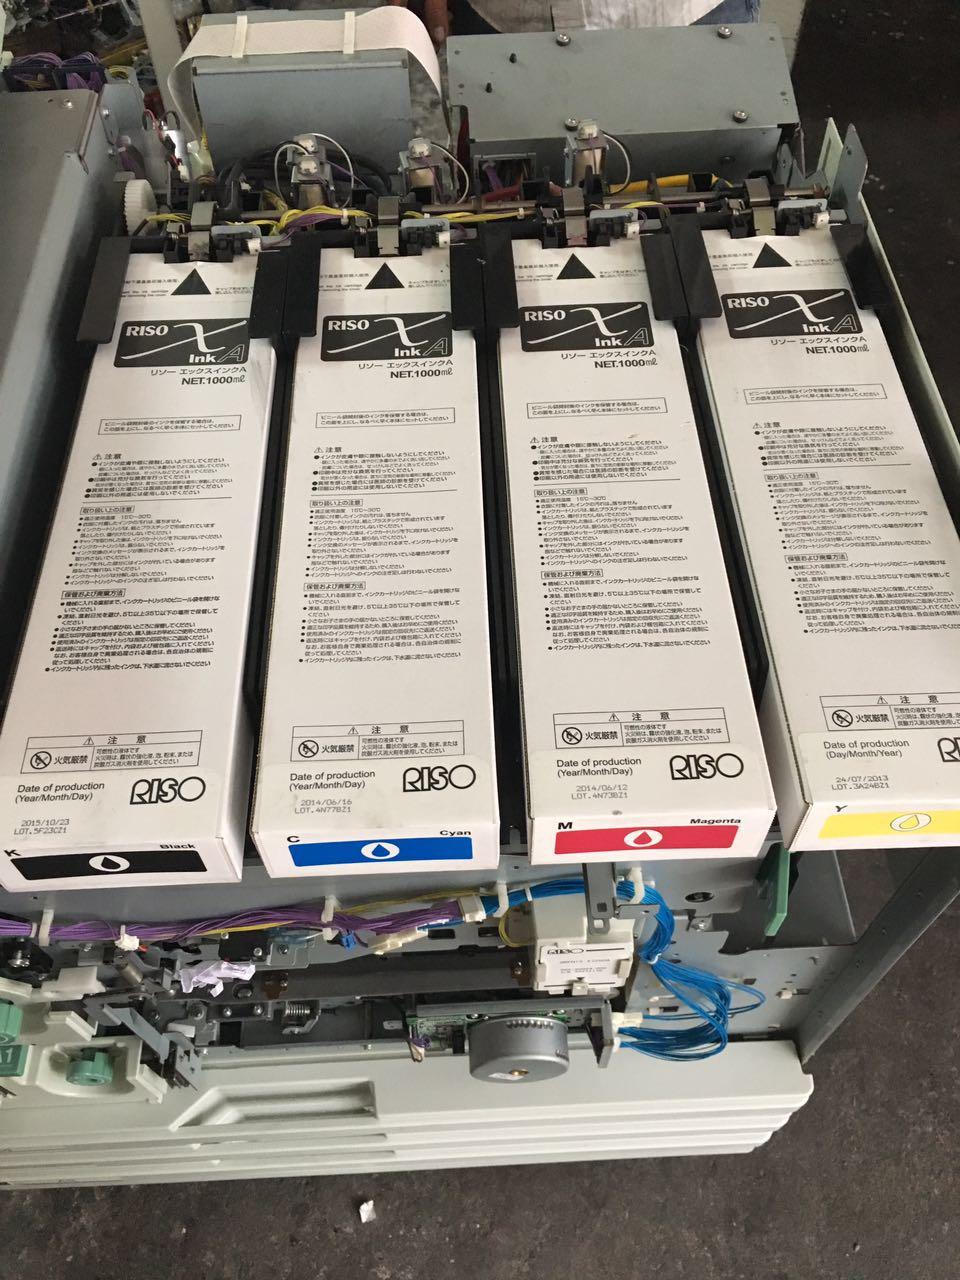 used risos comcolor inkjet printer EX9050 risographs printing machine copiers